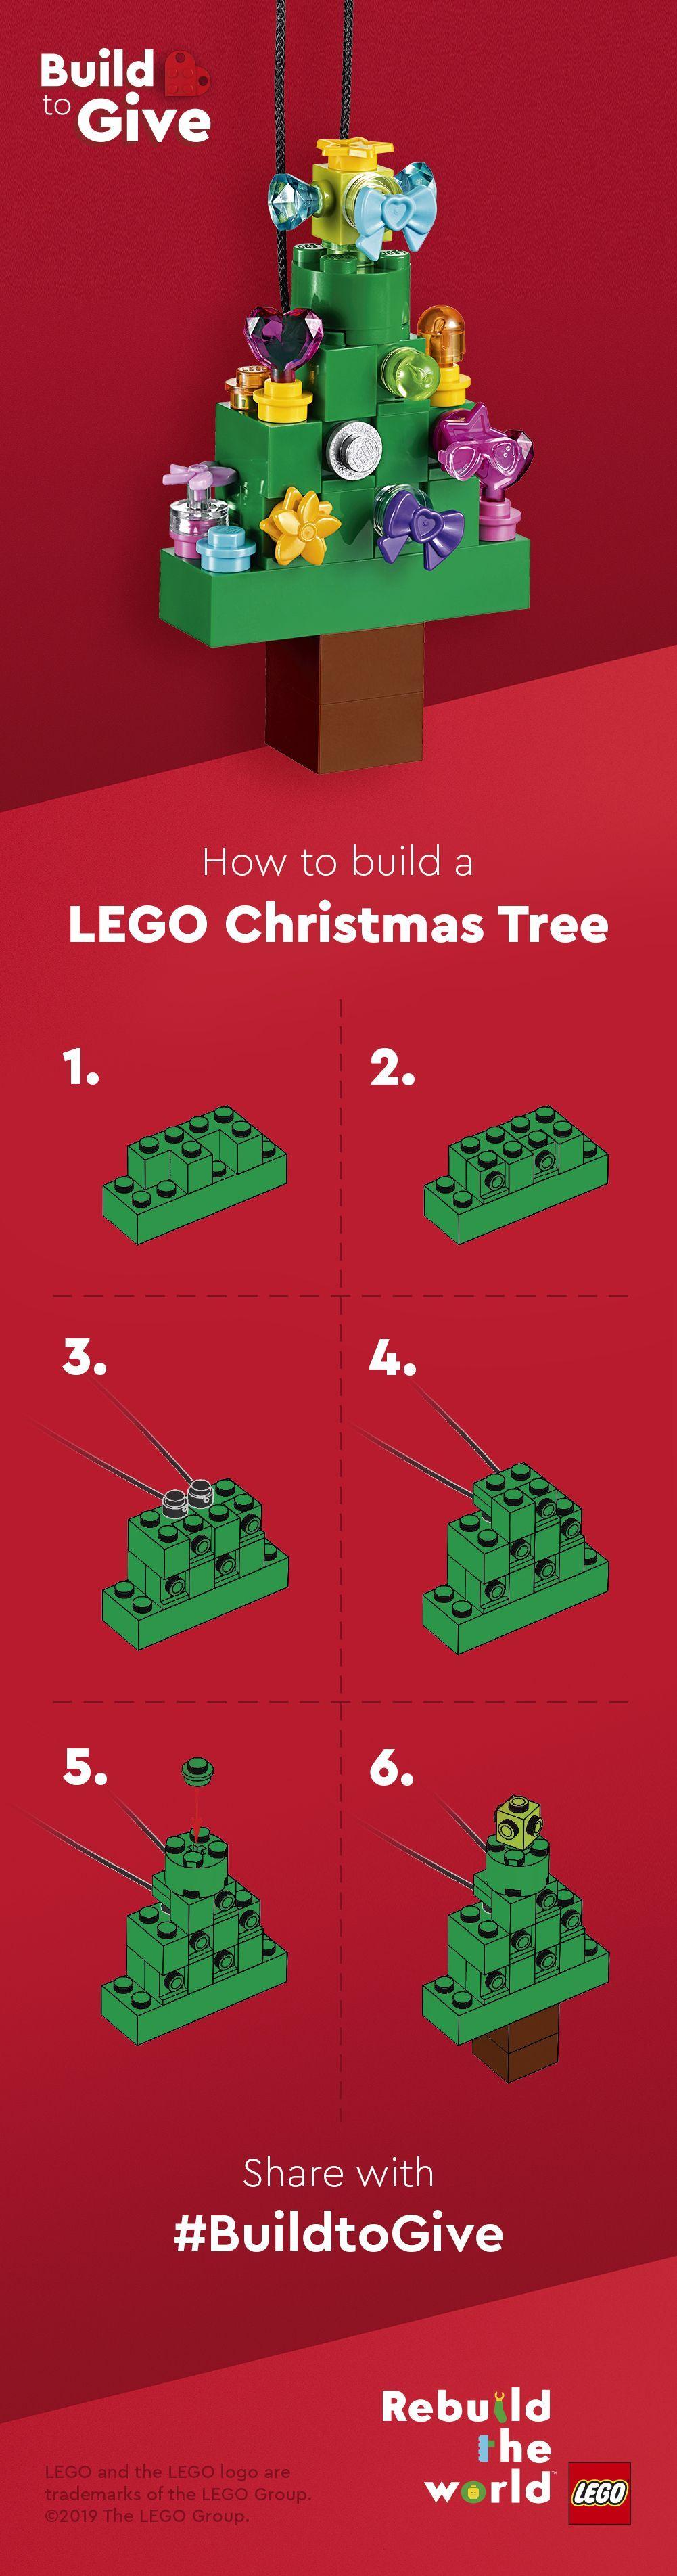 #build #Christmas #Decoration #Lego #Tree Build your own LEGO Christmas tree dec…